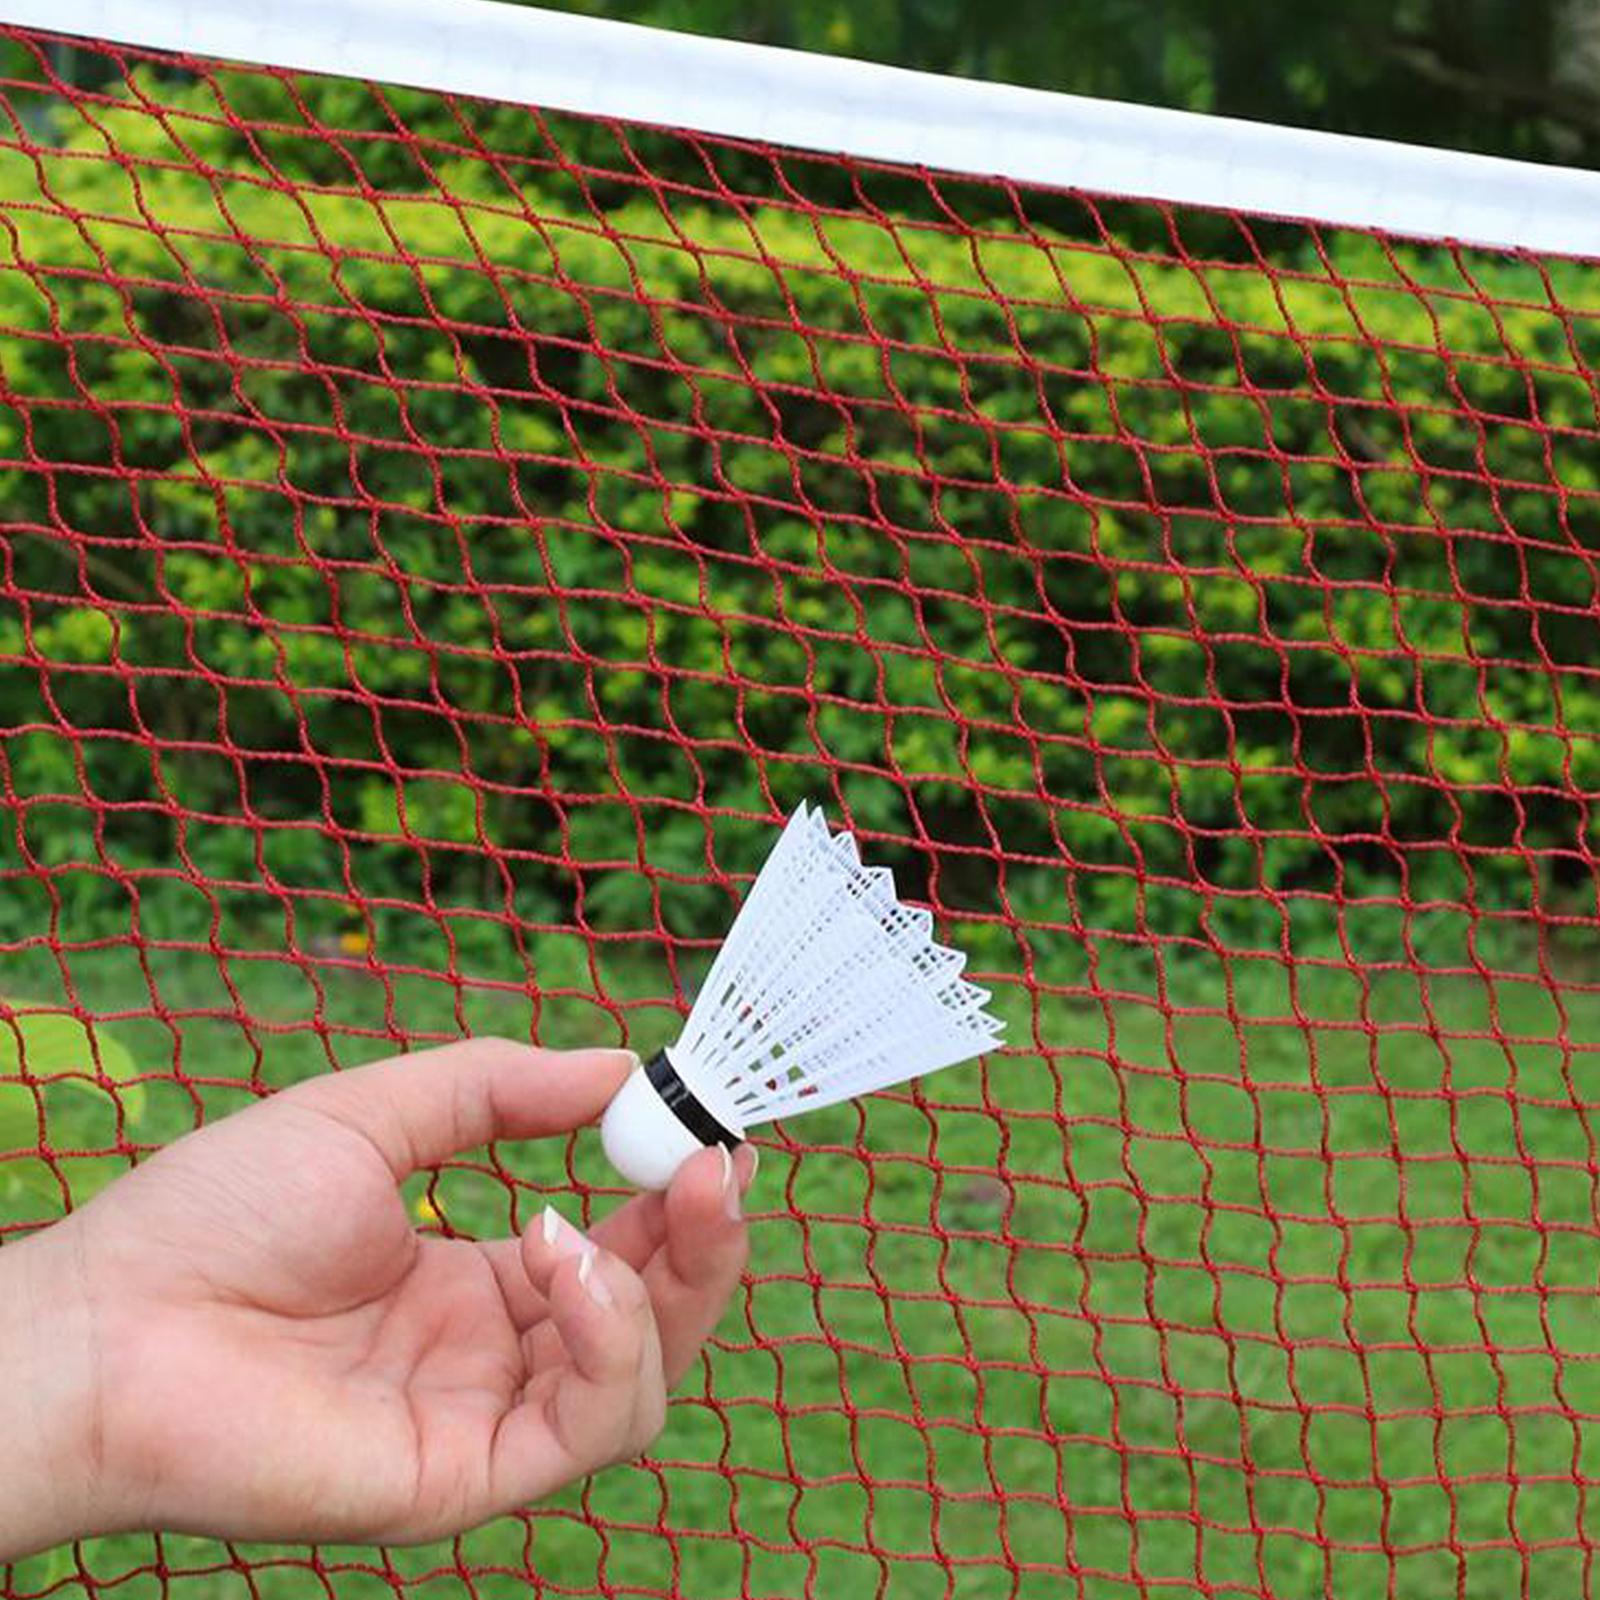 Red-Badminton-Tennis-Volleyball-Net-For-Beach-Garden-Indoor-Outdoor-Games-Sport thumbnail 10